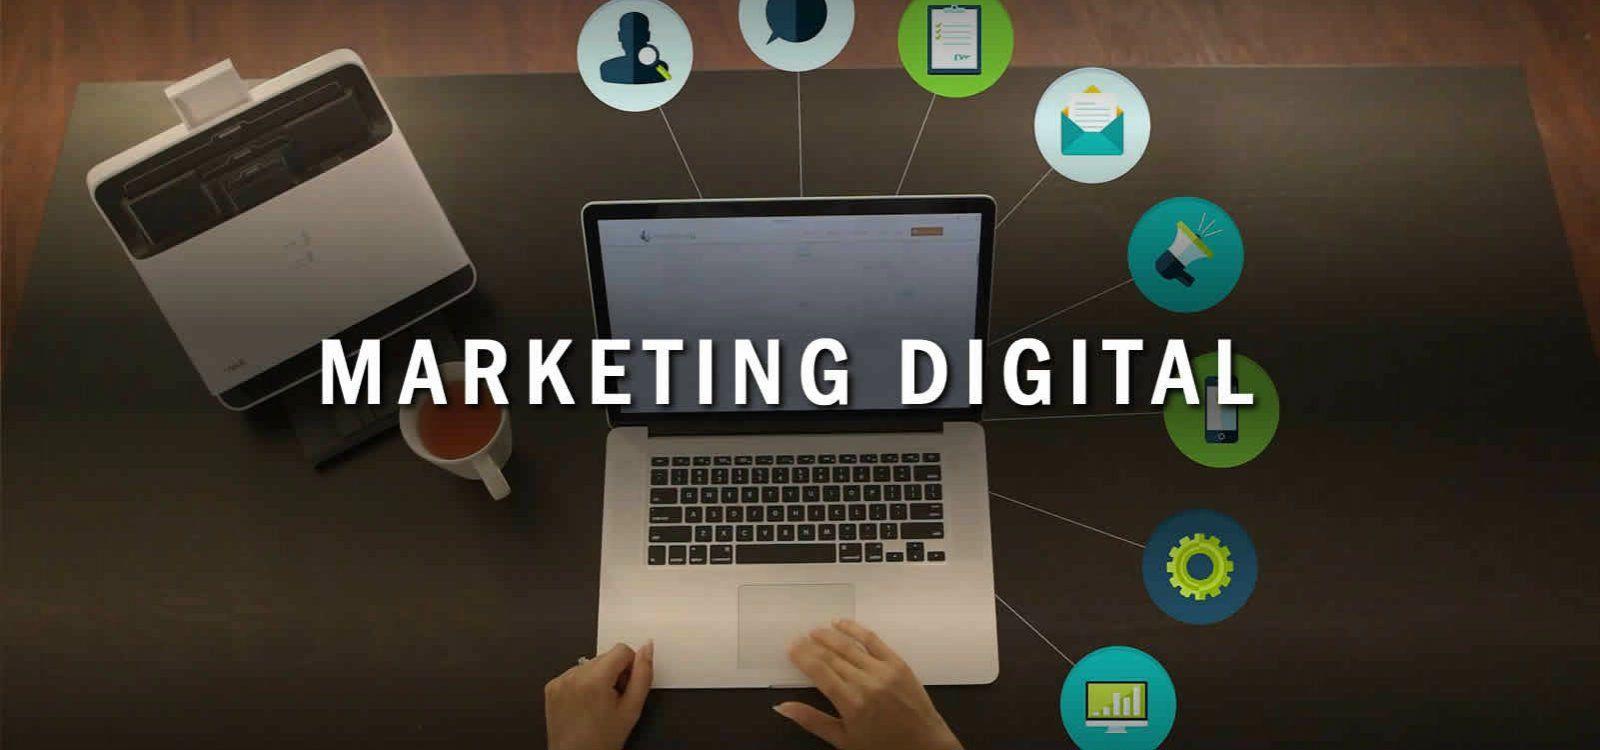 diseno-marketing-agencia-digital-nuevet-web-2-1600×750-digital-marketing